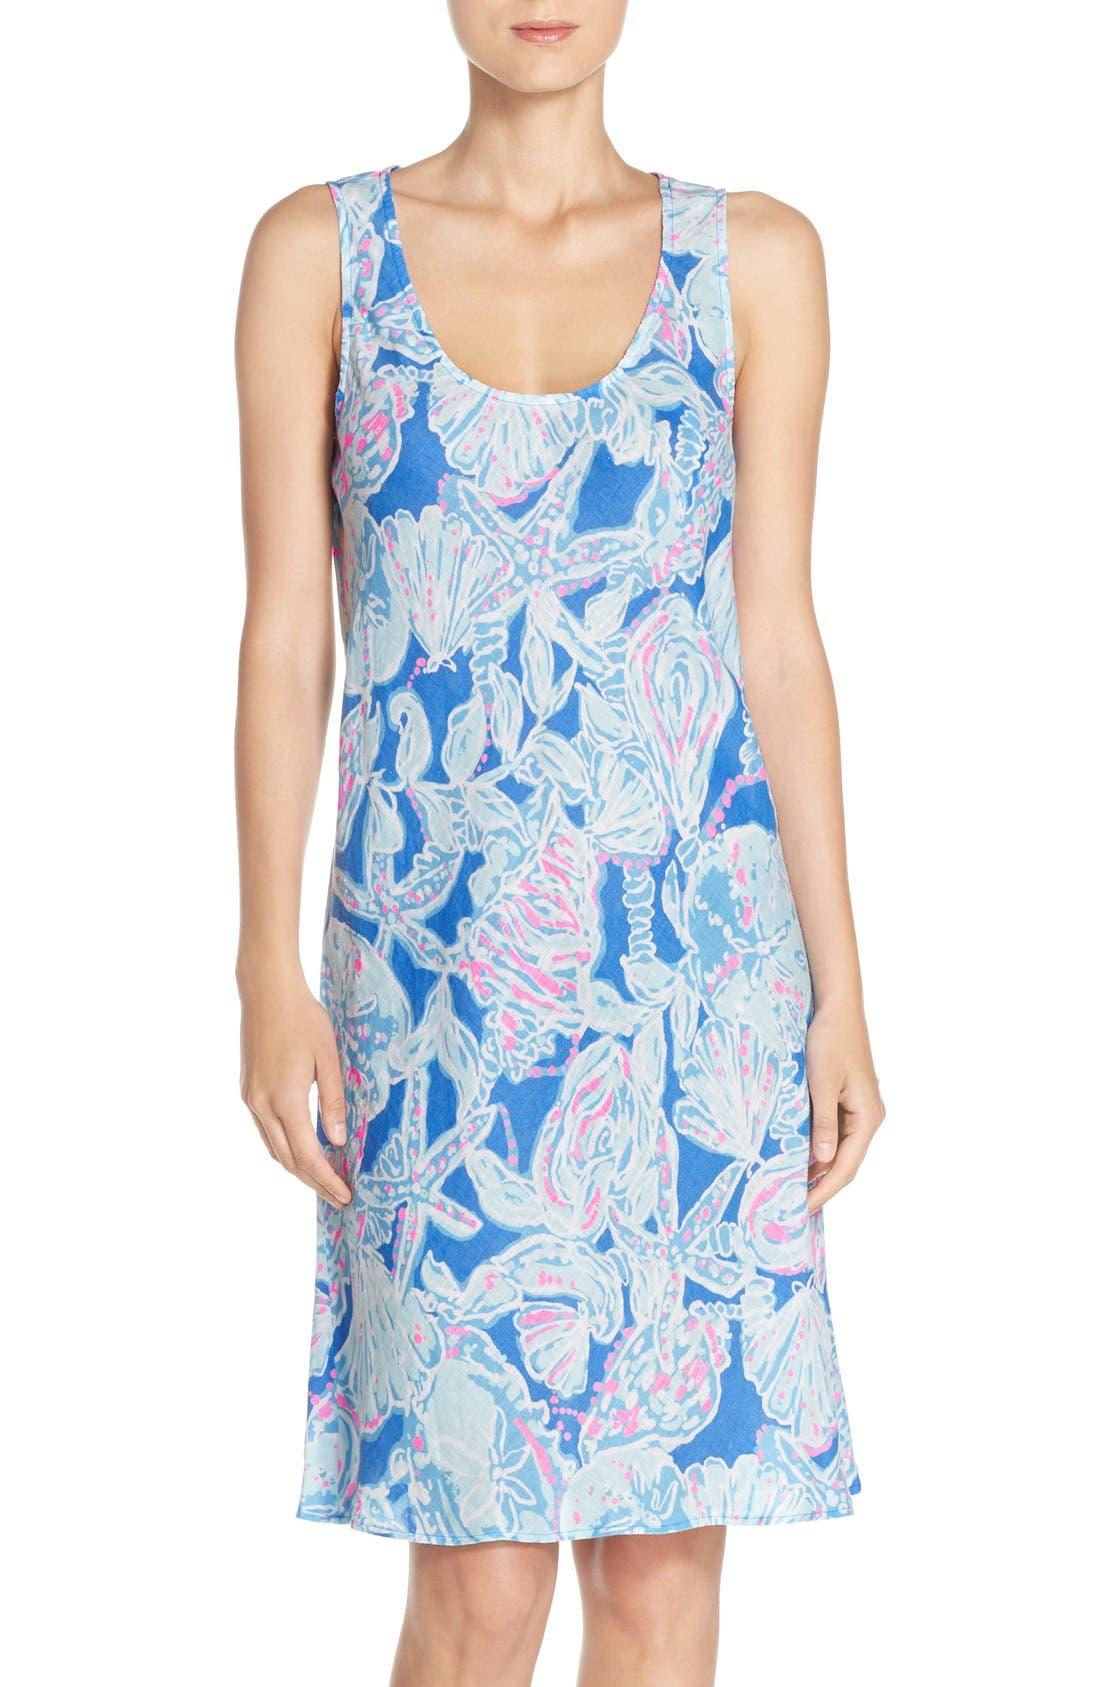 Main Image - Lilly Pulitzer® 'Patterson' Print Linen Sheath Dress